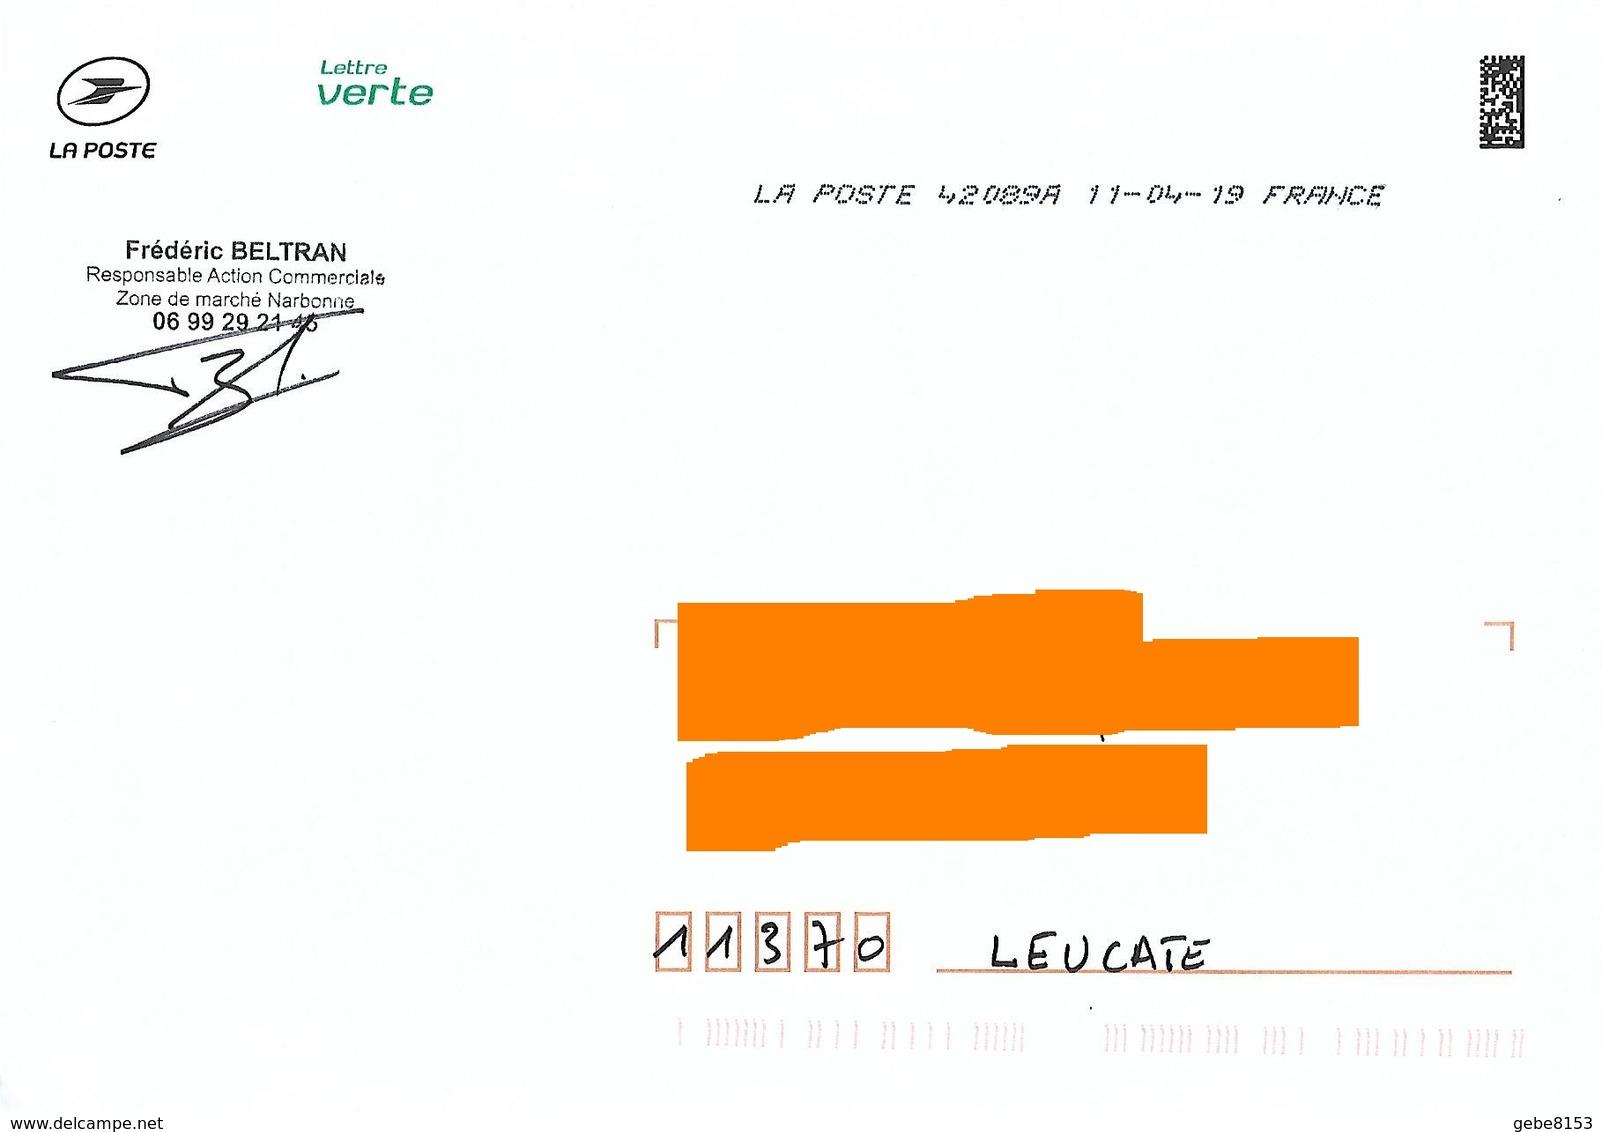 Enveloppe Service La Poste Lettre Verte Narbonne Aude Demi Toshiba - Postdokumente